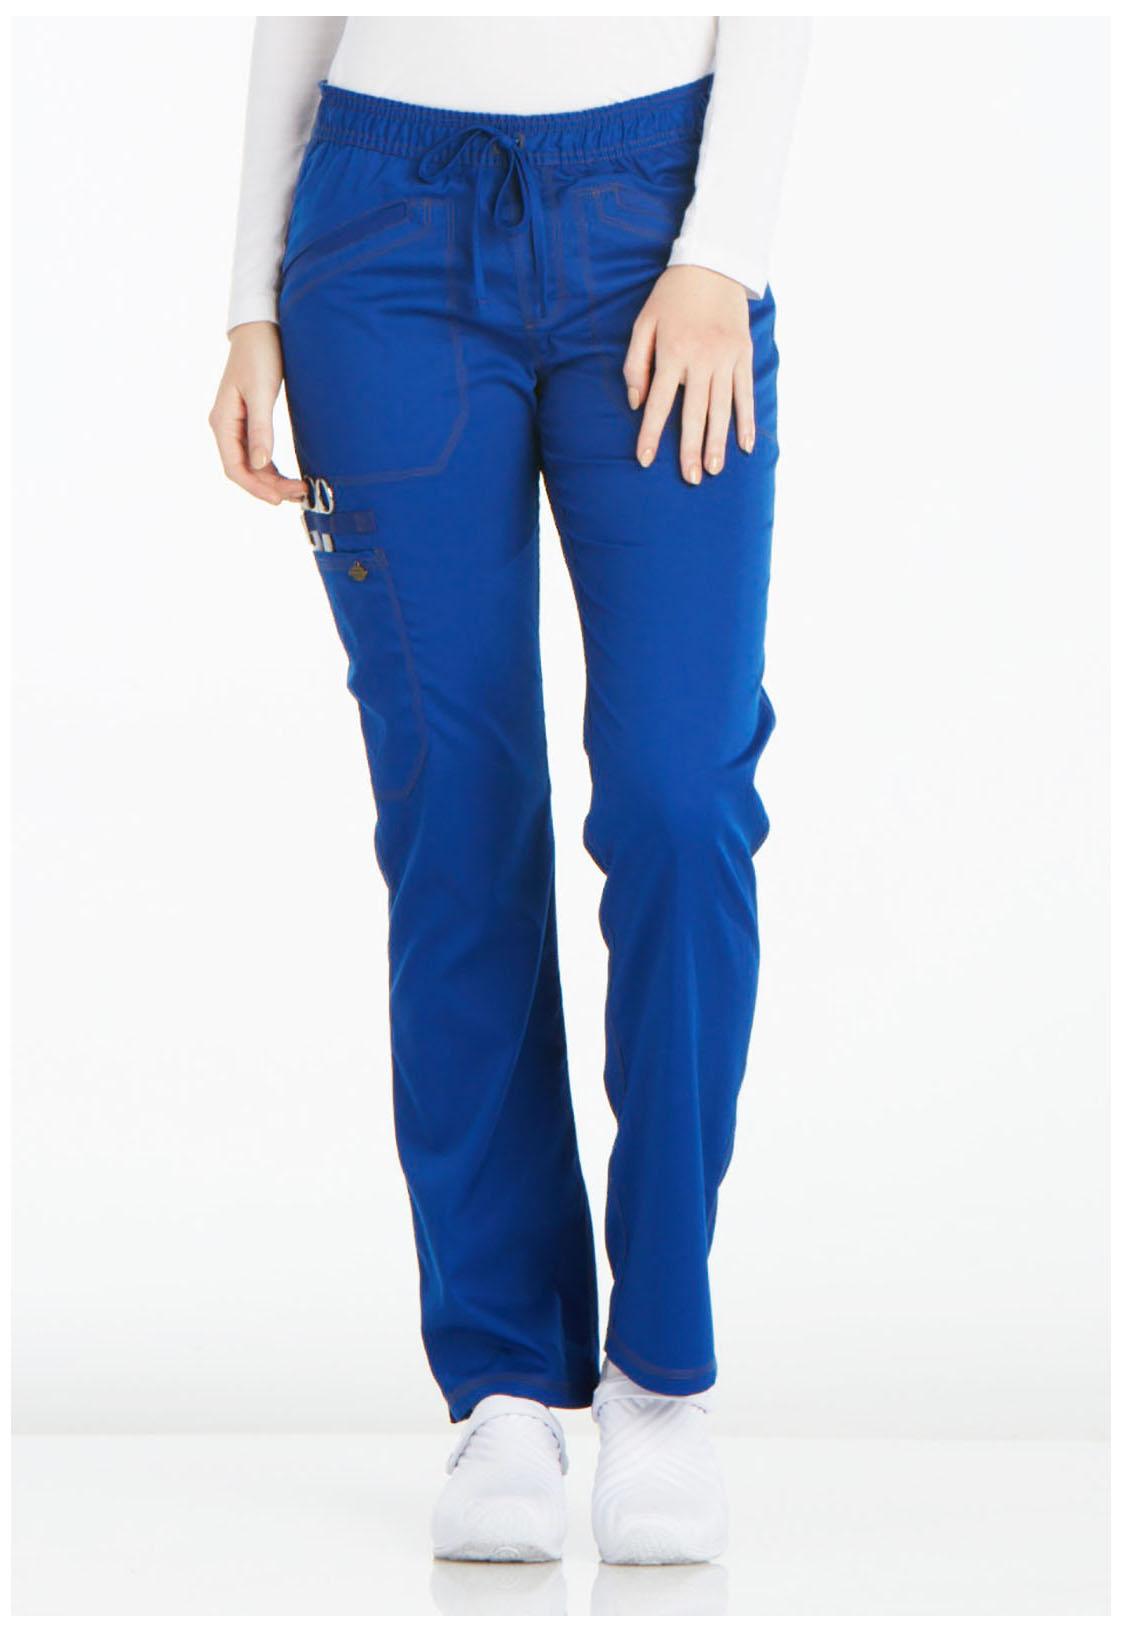 972b09c0f0b Essence Mid Rise Straight Leg Drawstring Pant in Galaxy Blue DK106P ...